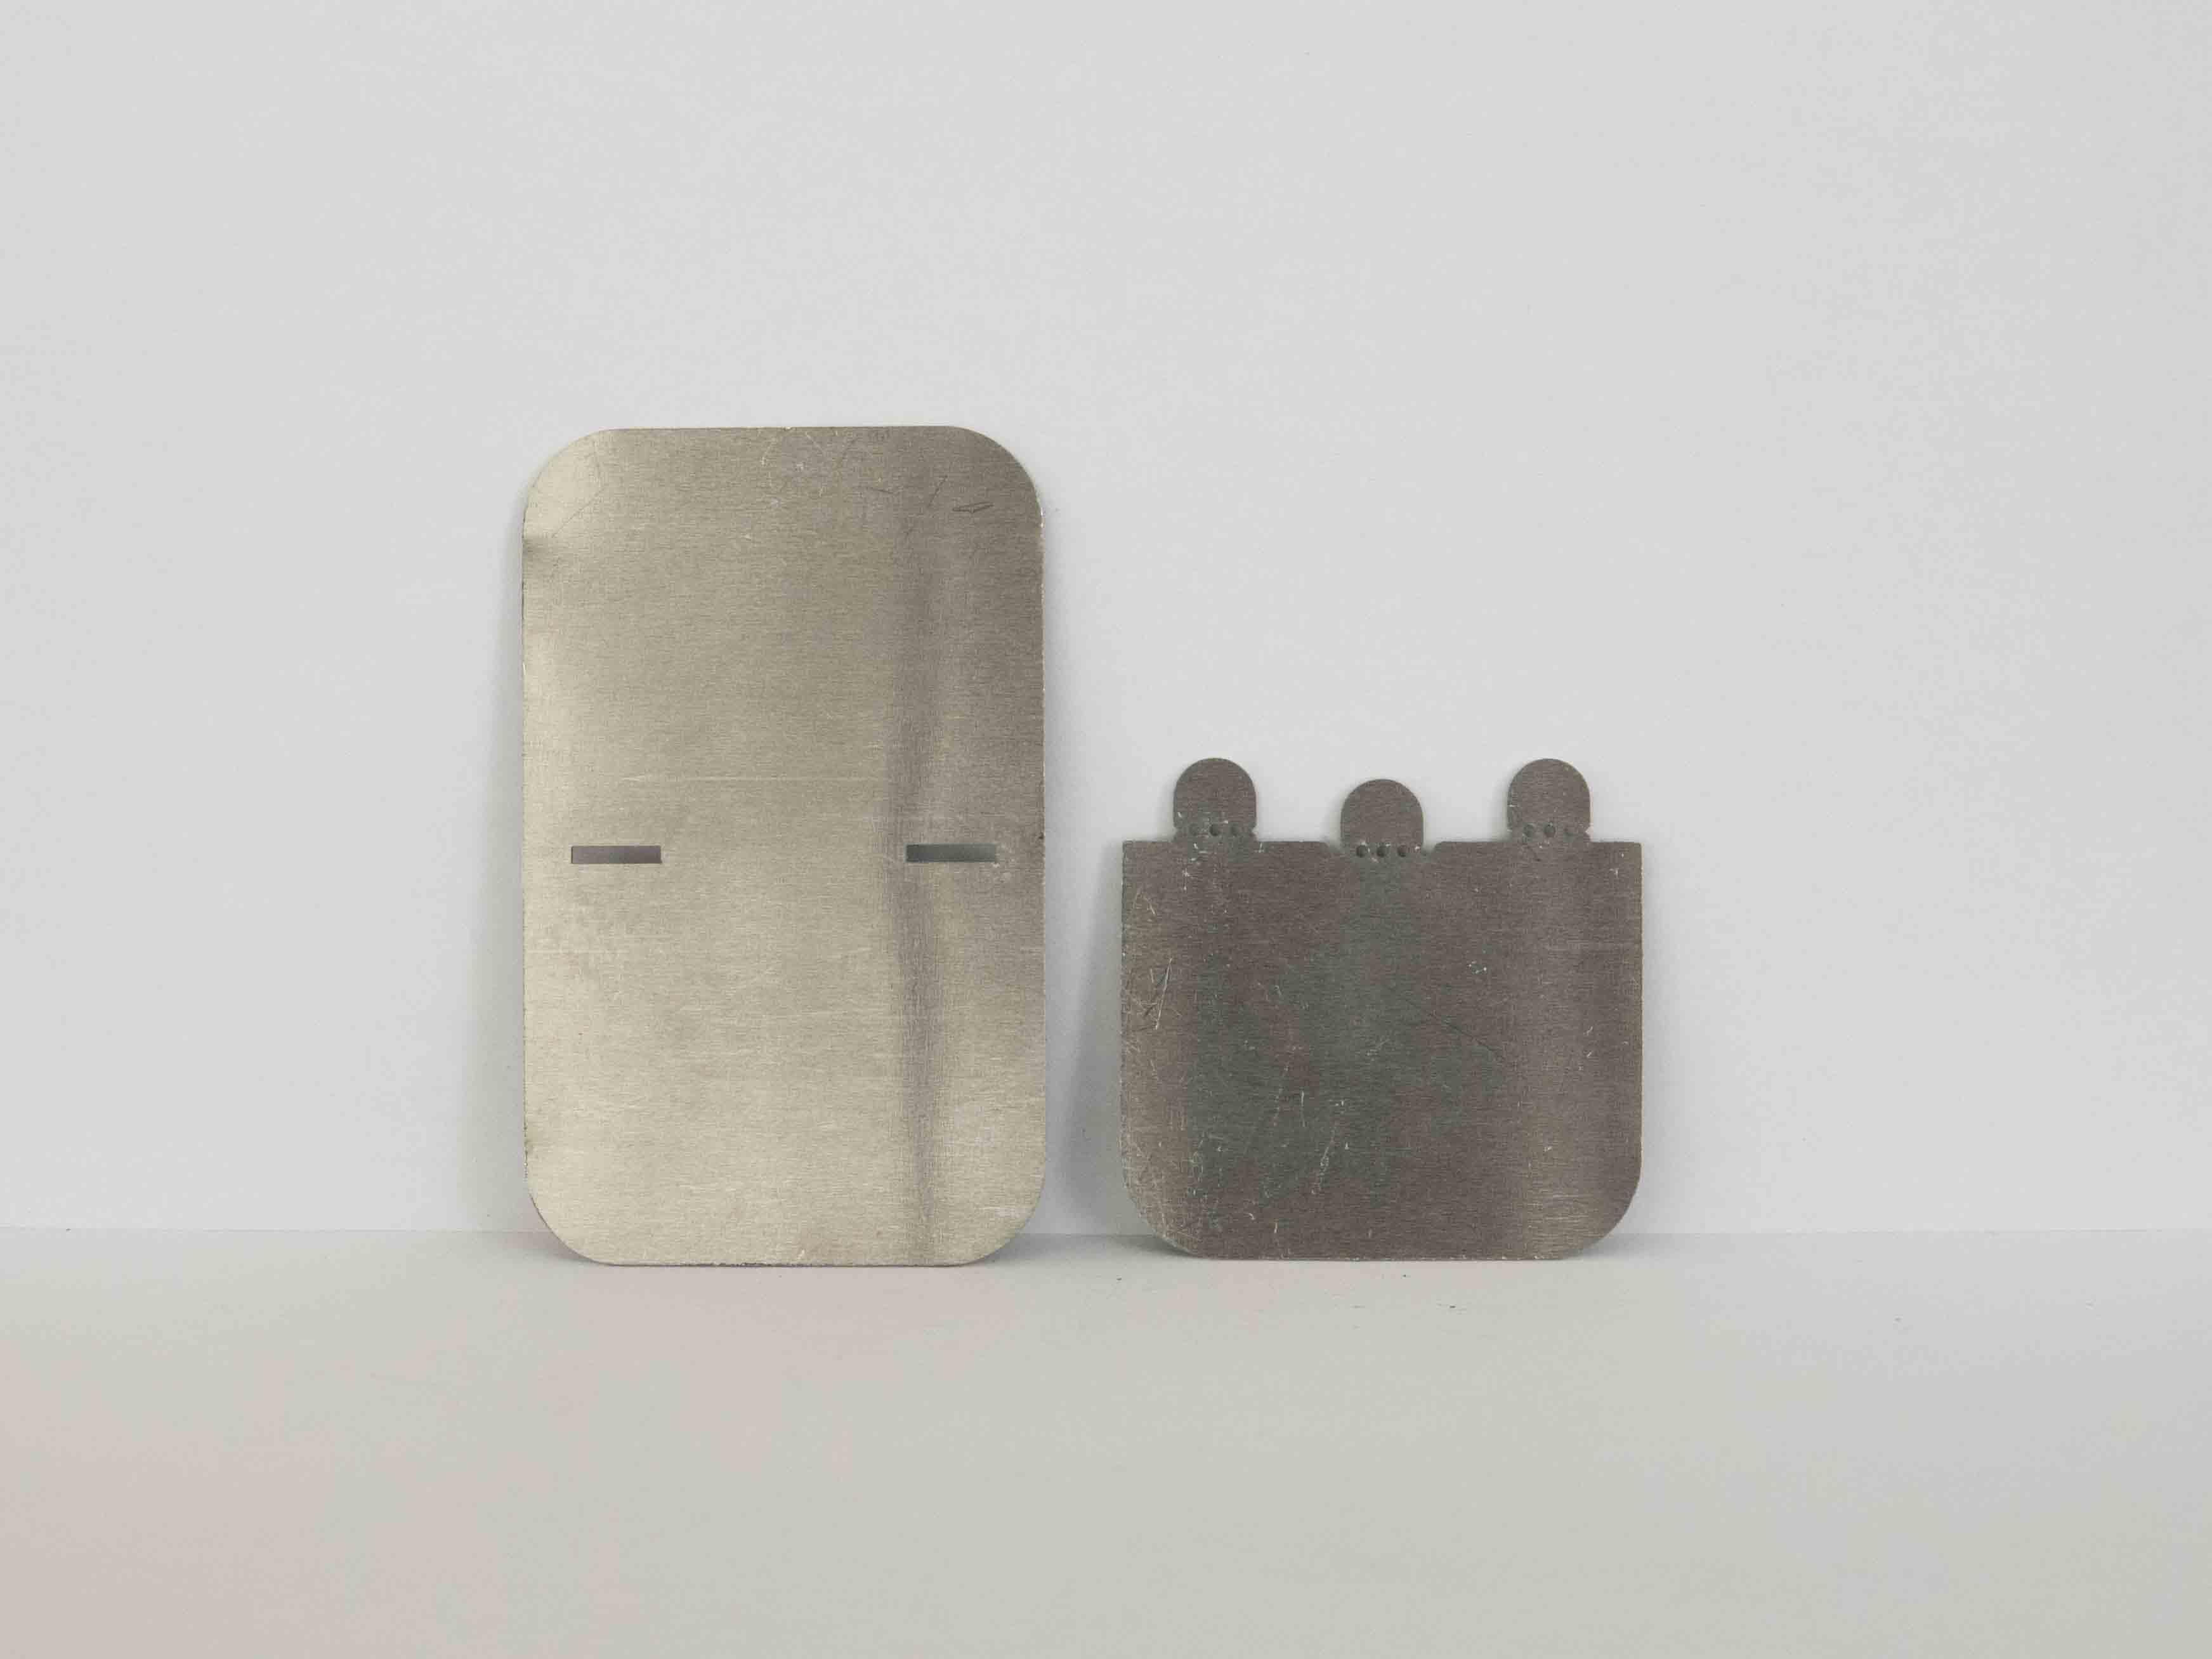 Laser cut metal fastening perpendicular clipsing